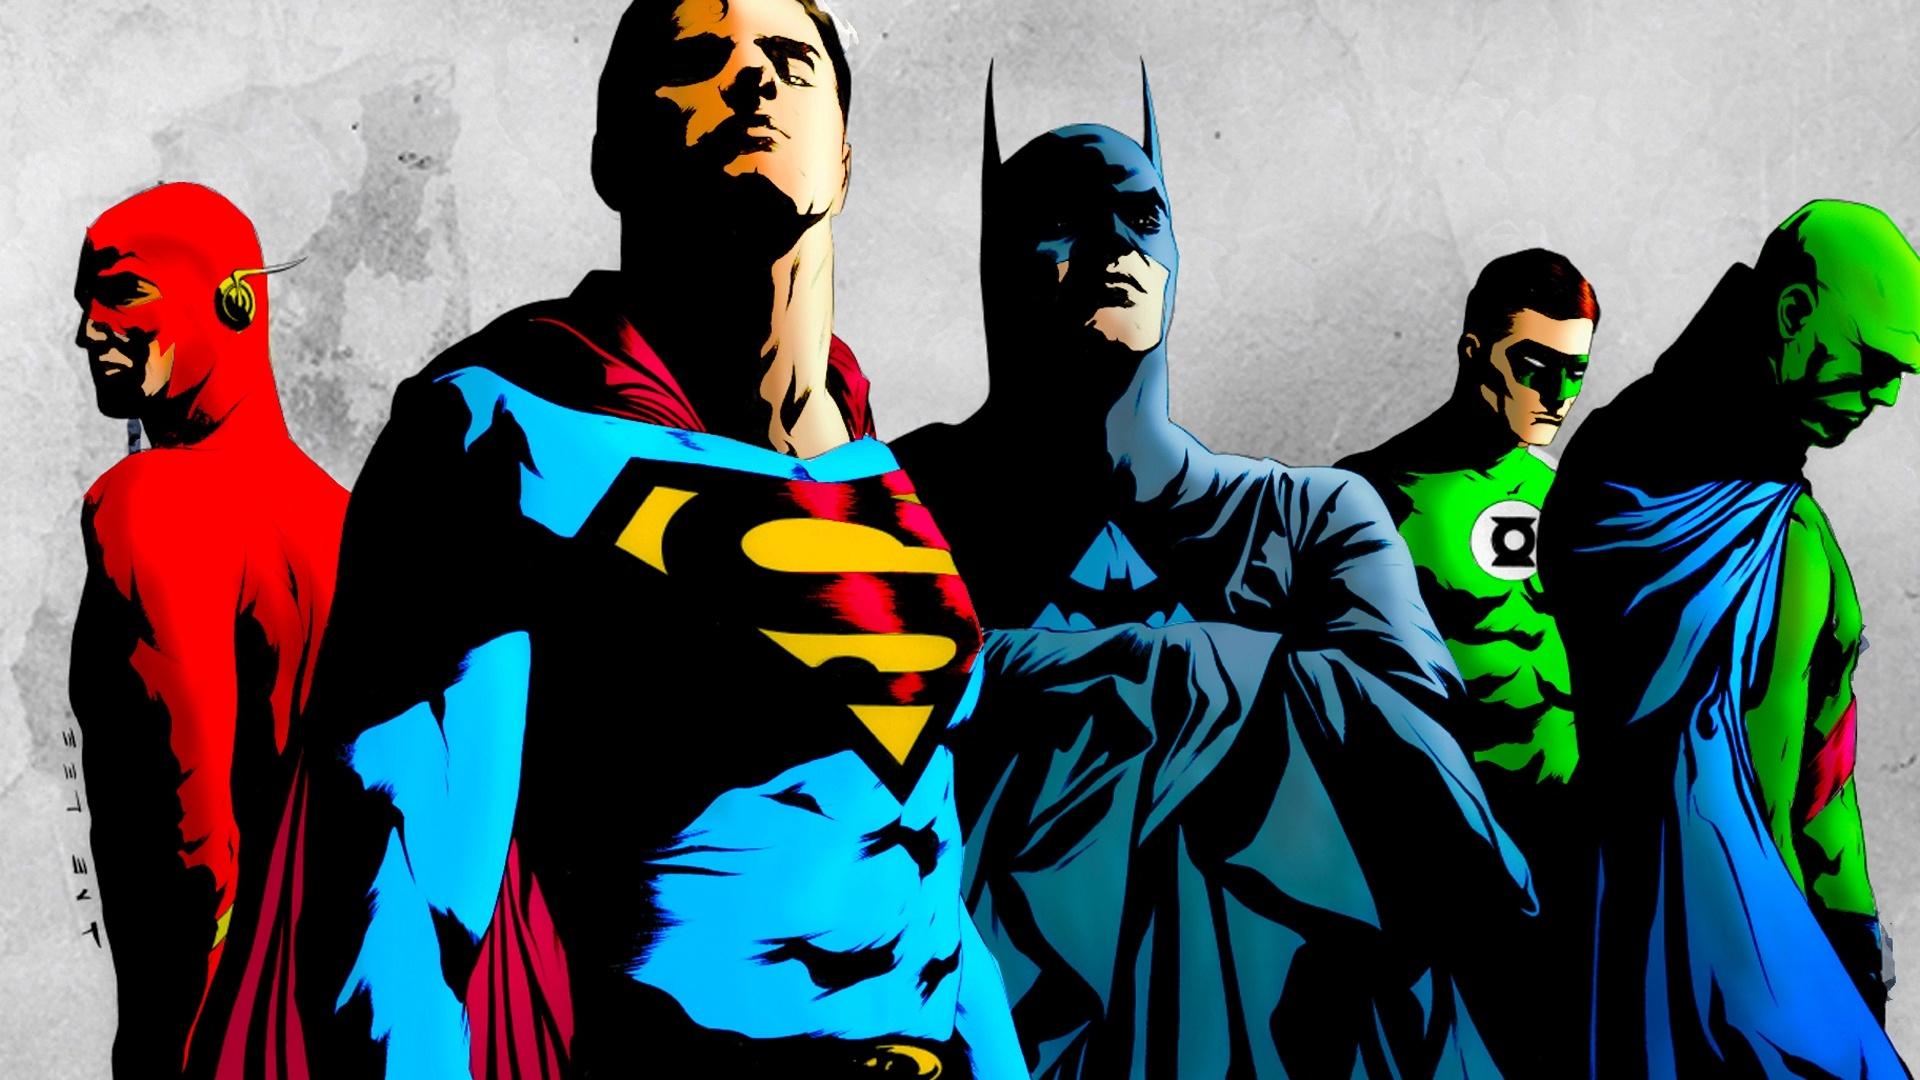 Justice League desktop background